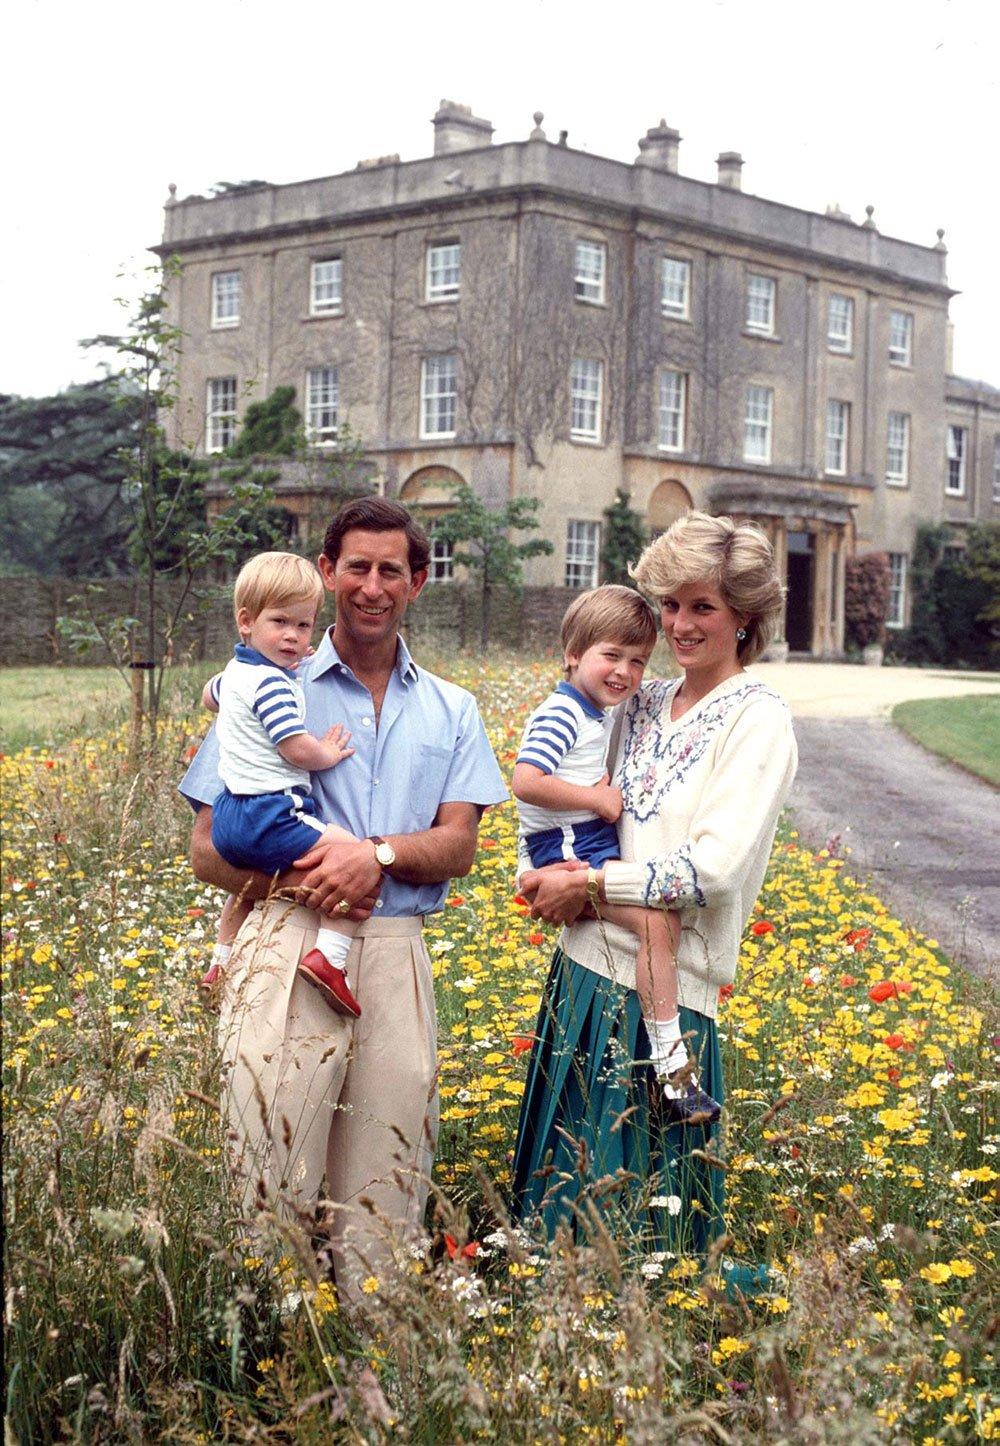 Happy Birthday to Princess Diana